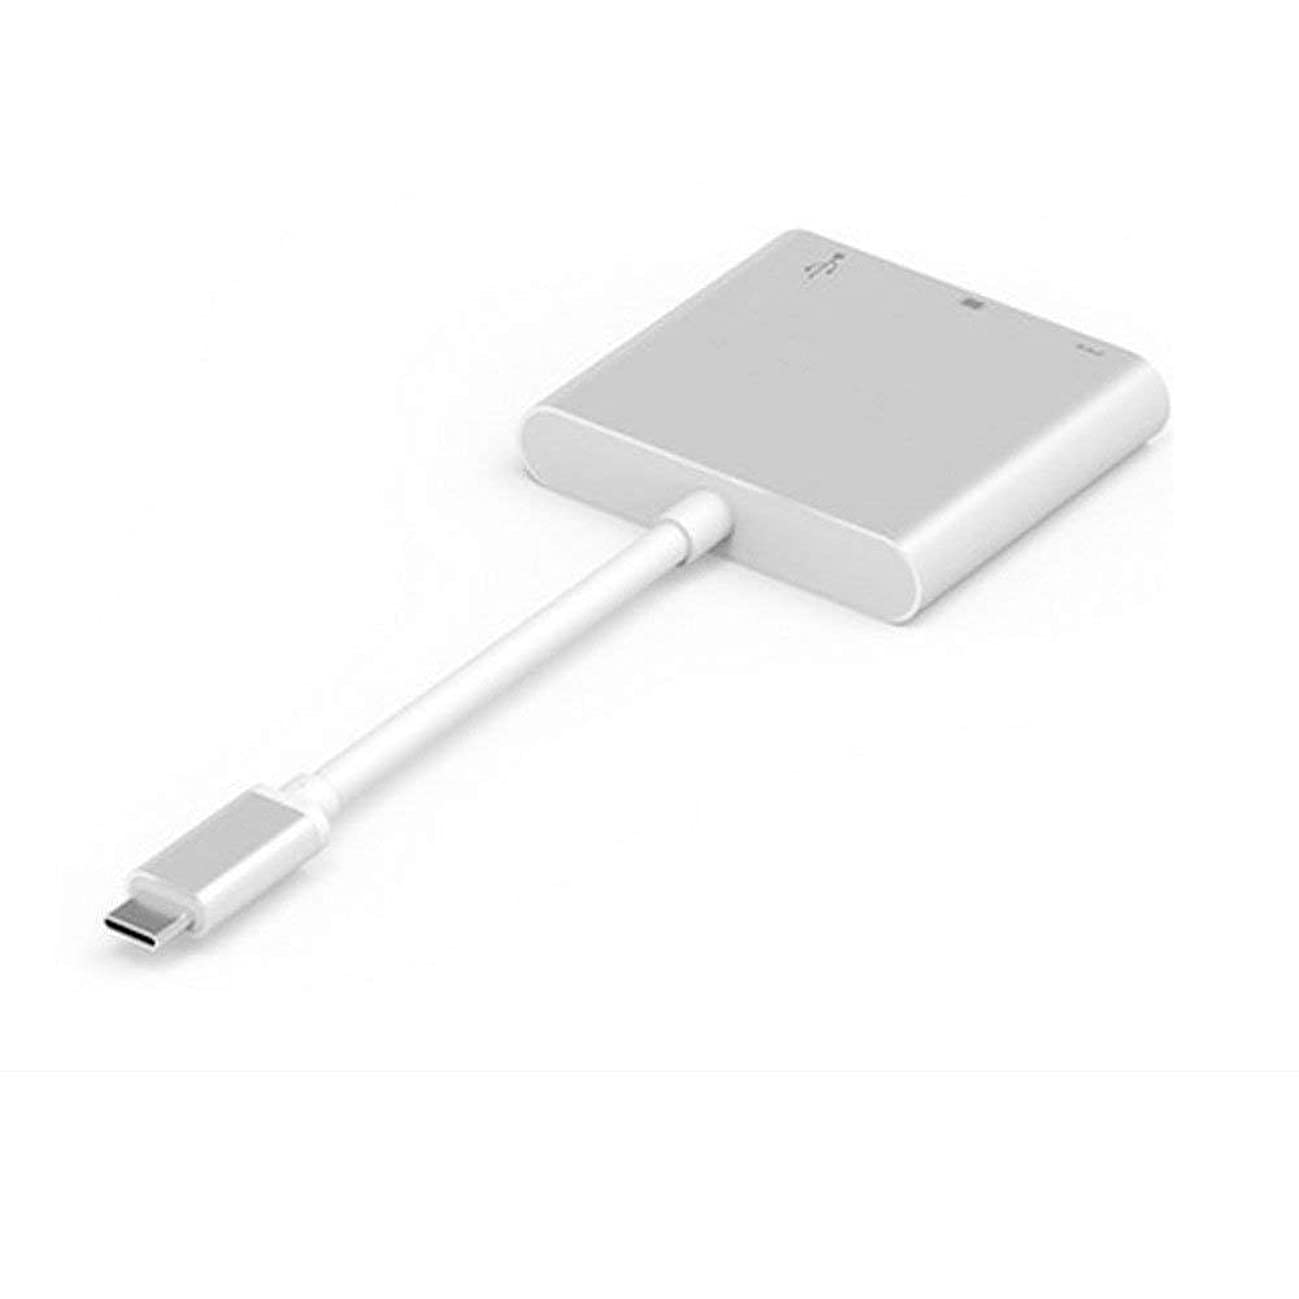 Manakayla TC07 USB3.1 Type-C to HDMI Adapter Cable HDMI Converter 4K2K HD Display Gray